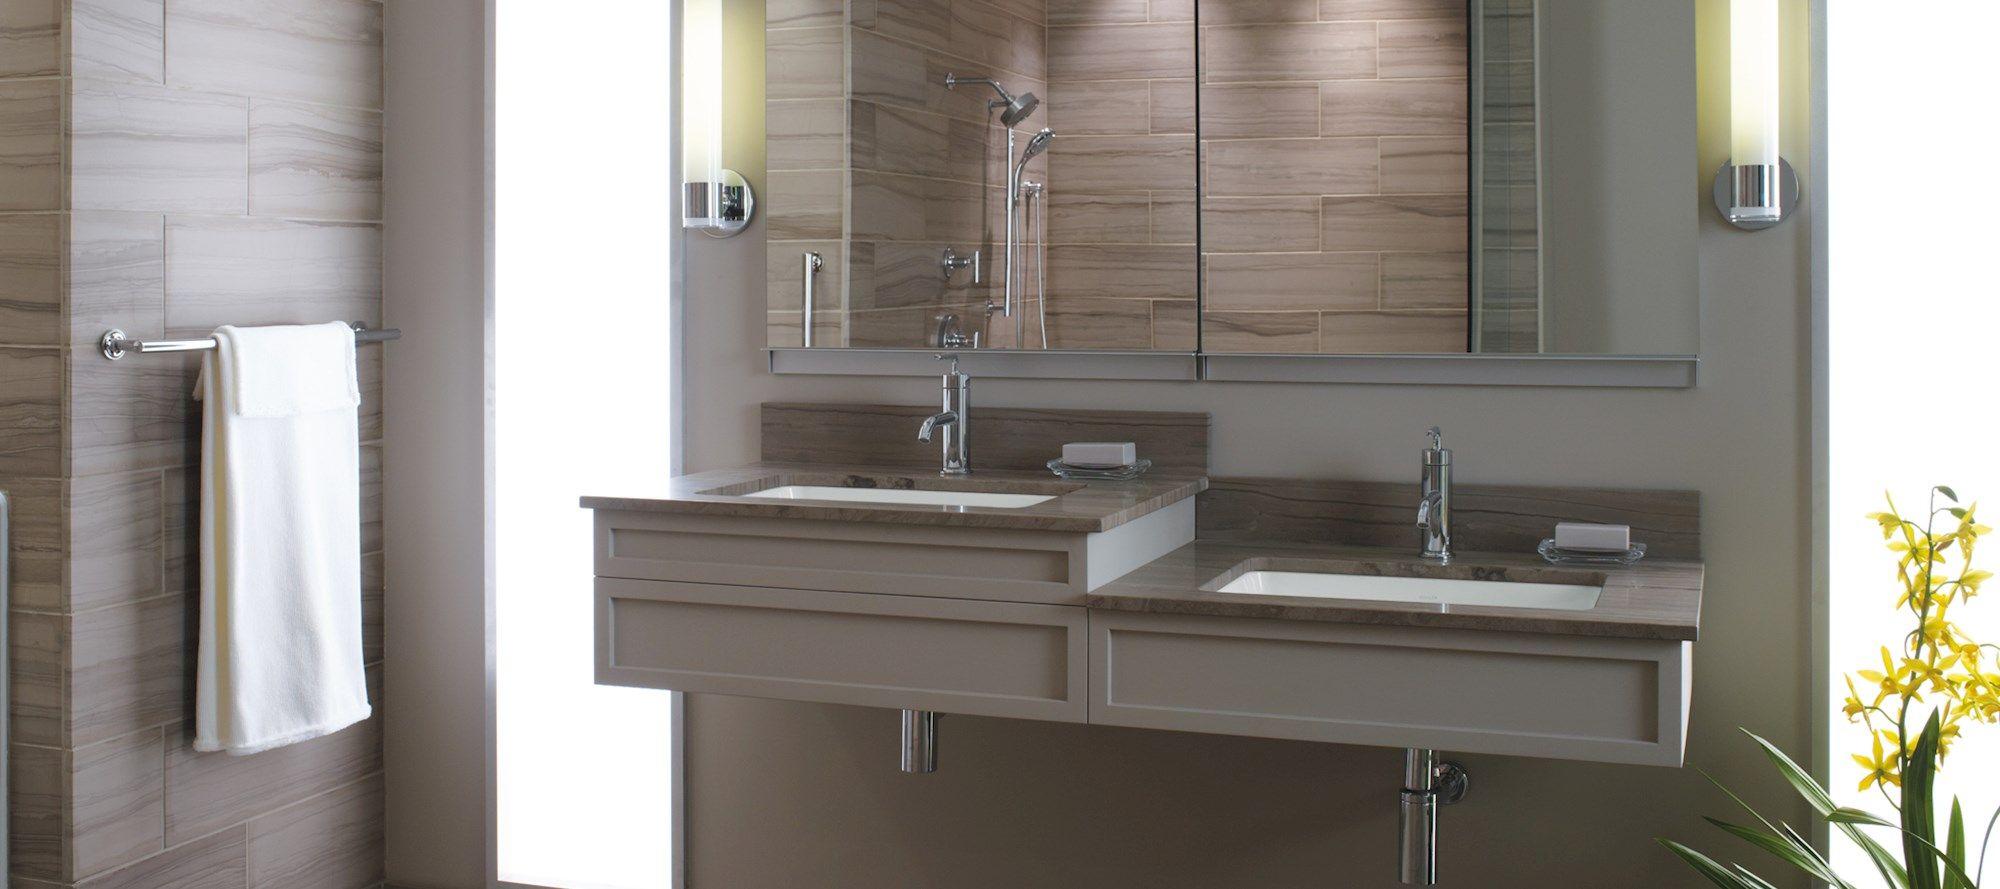 Uplift Pendant In 2020 Vintage Bathroom Mirrors Eclectic Bathroom Small Bathroom Storage